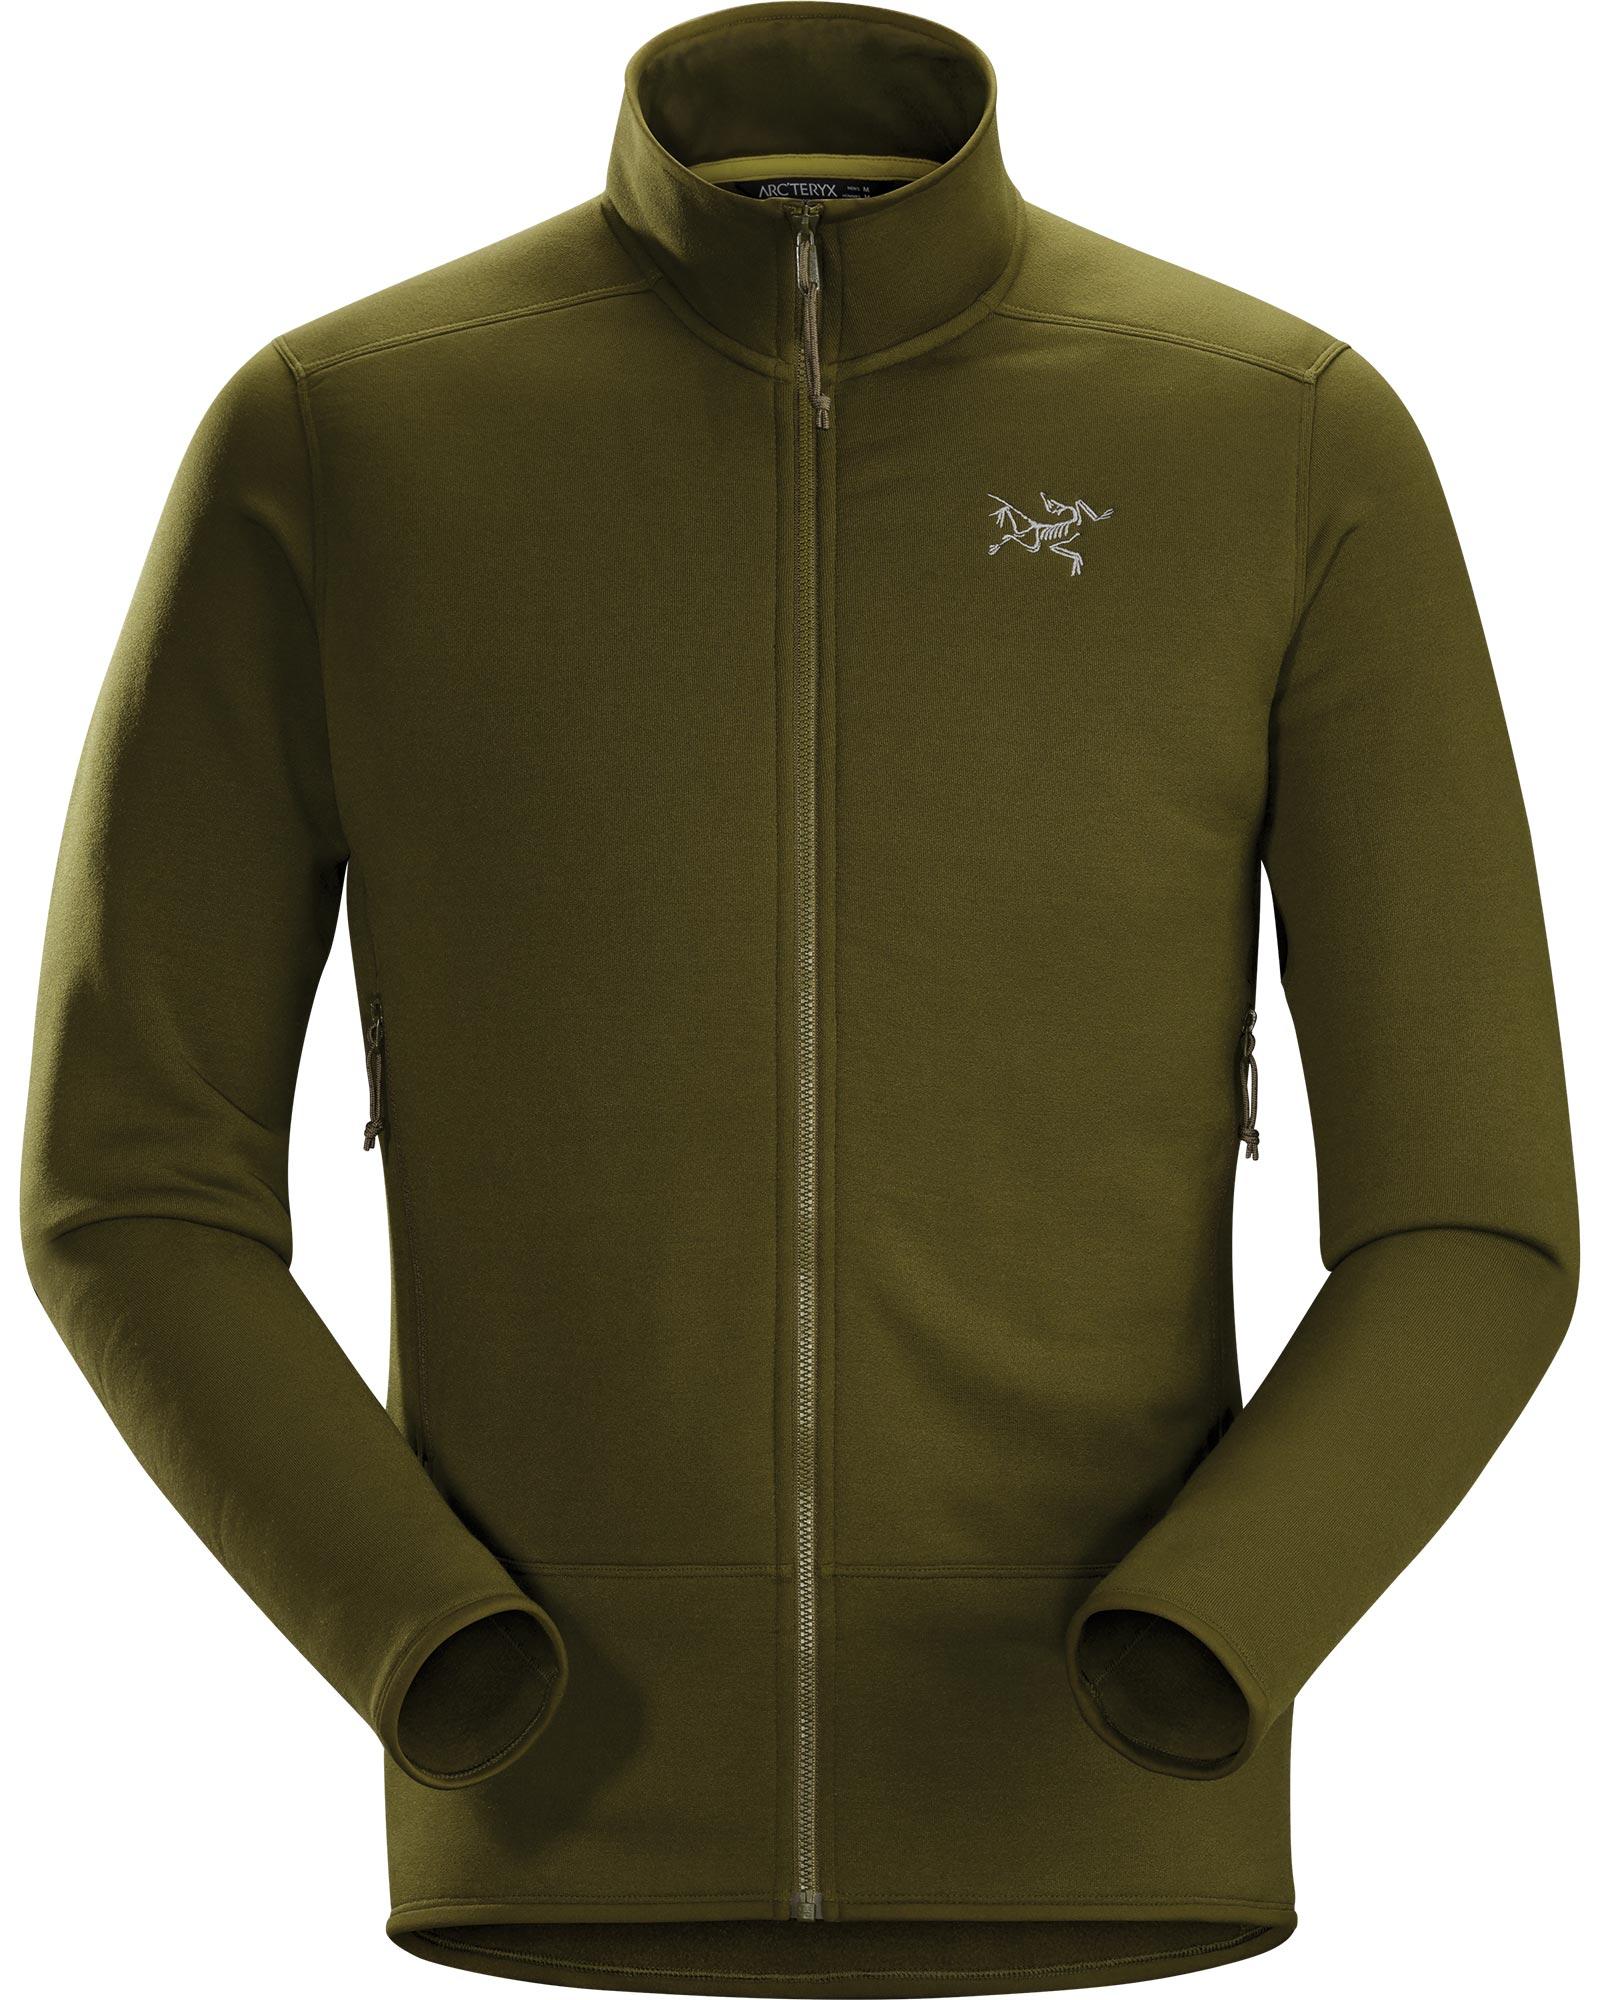 Arc'teryx Men's Kyanite Jacket 0